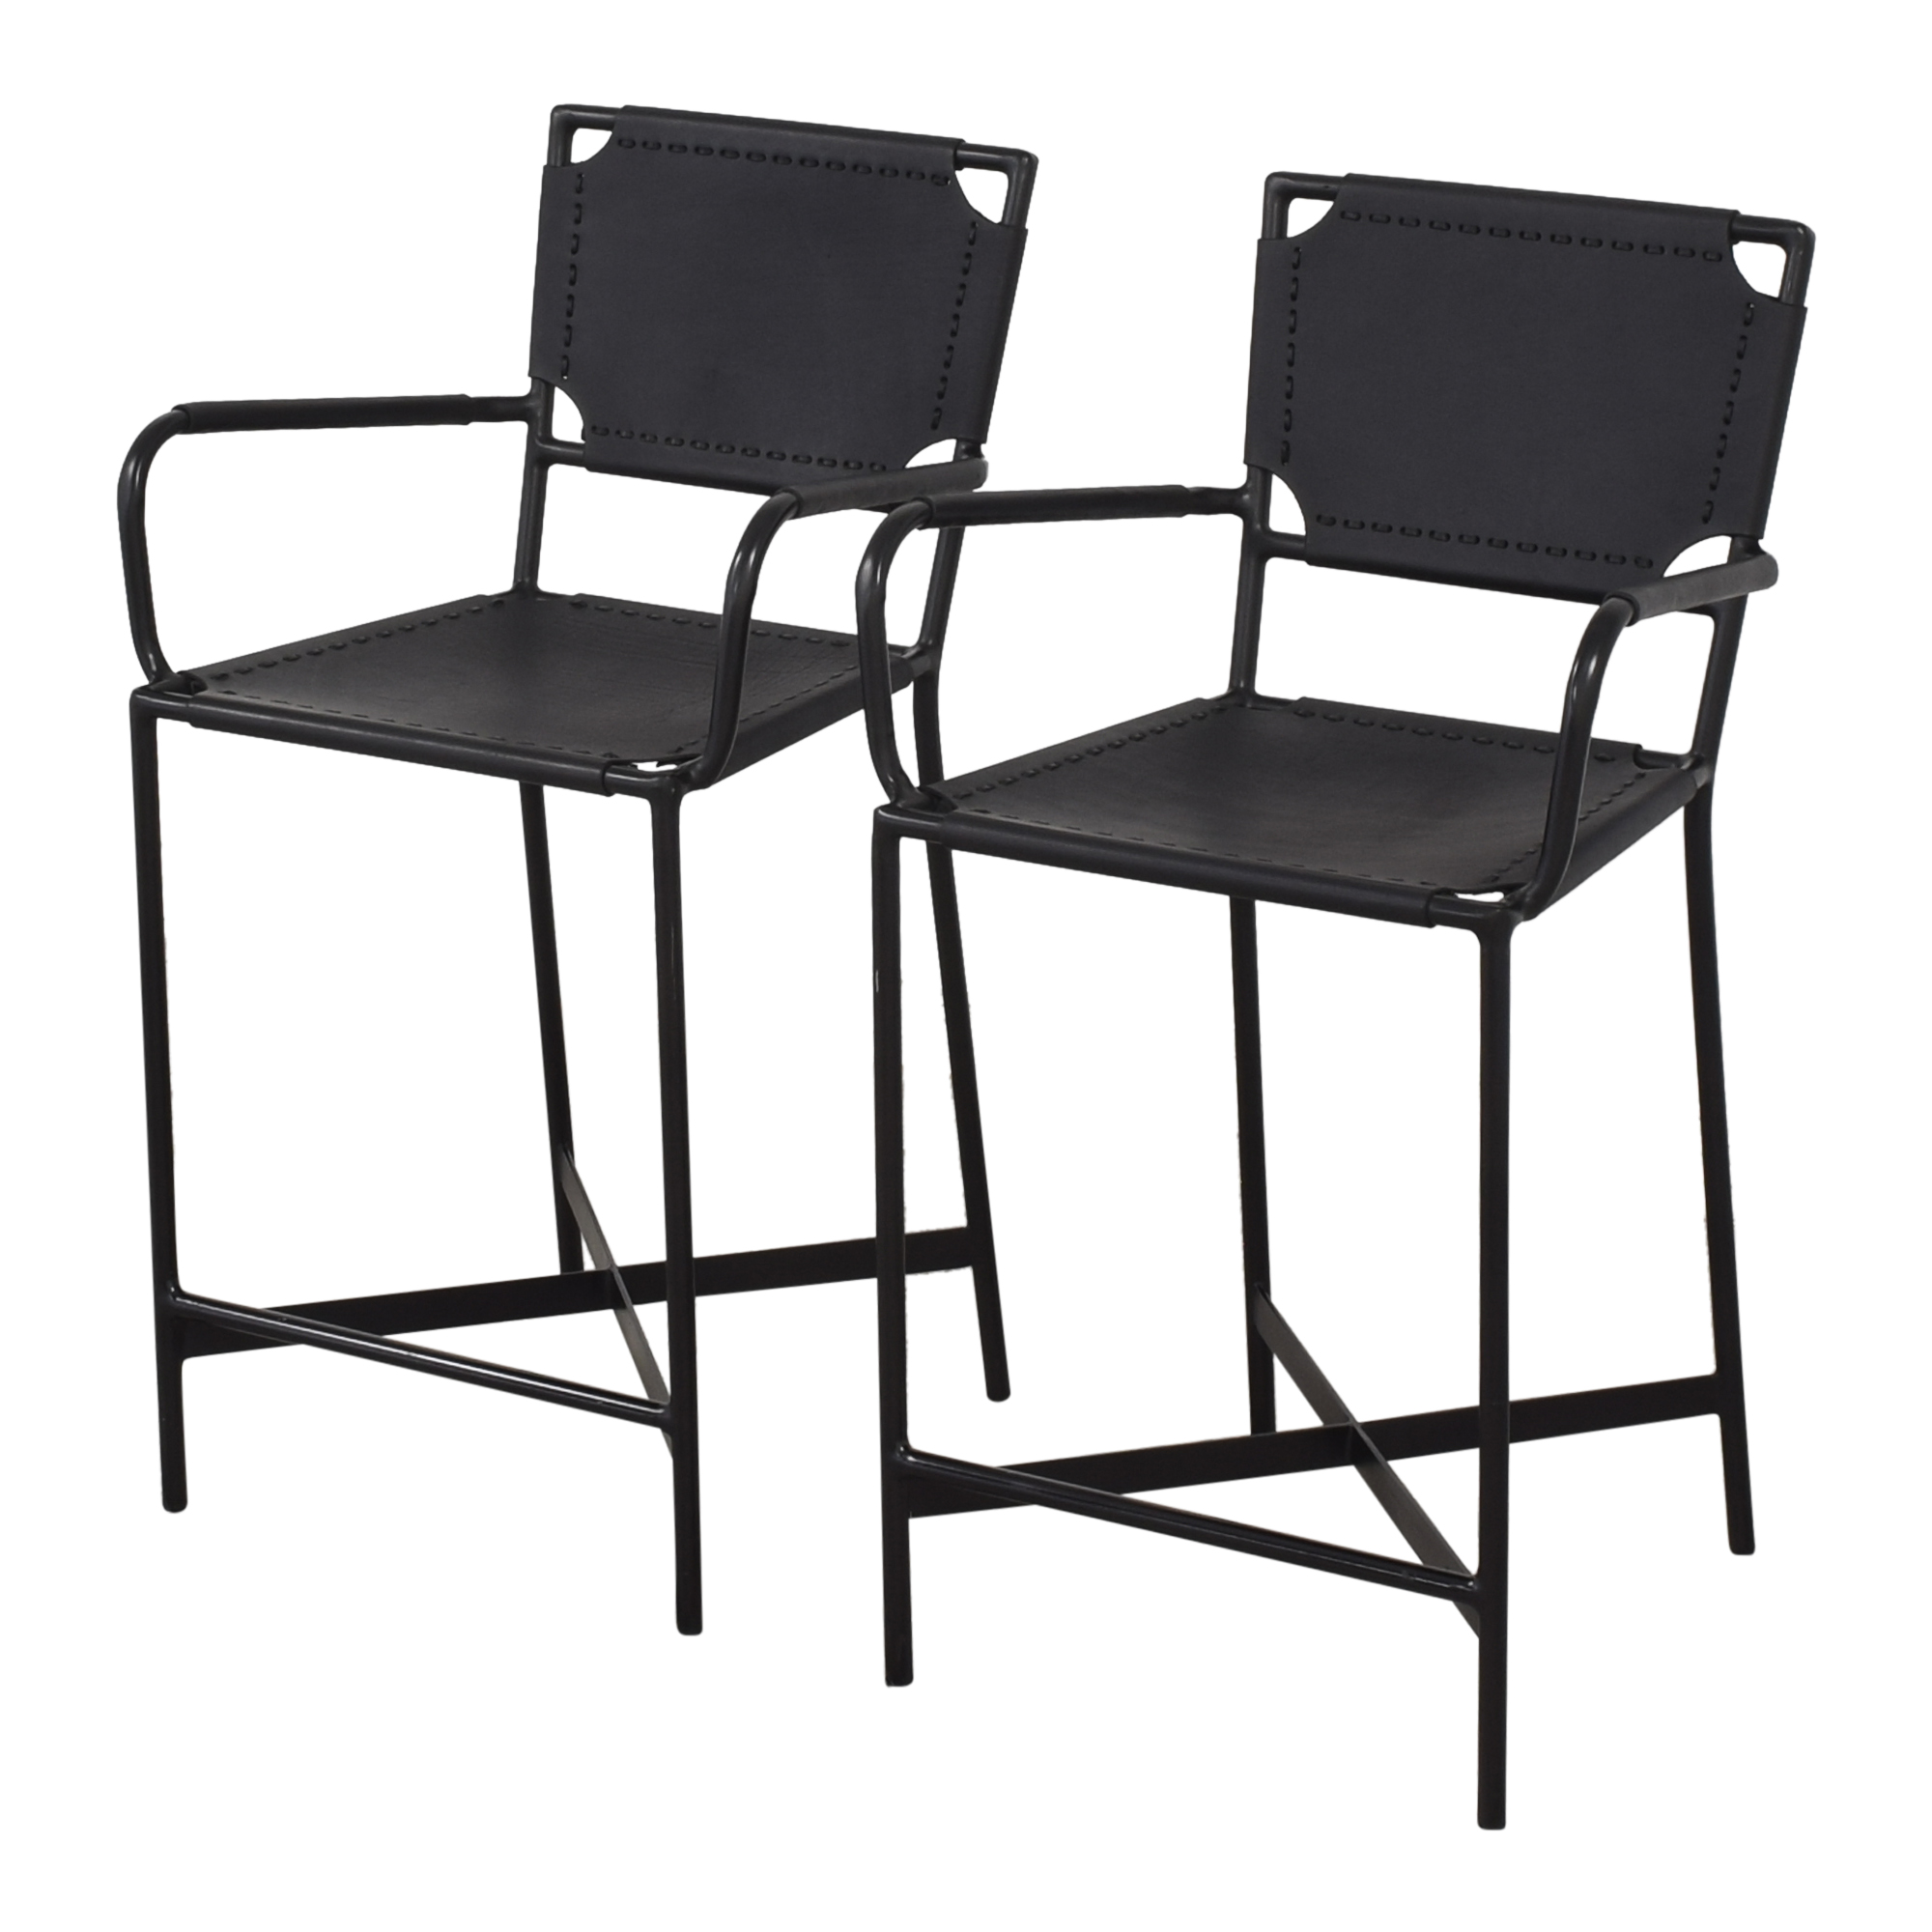 Crate & Barrel Crate & Barrel Laredo Counter Stools Chairs